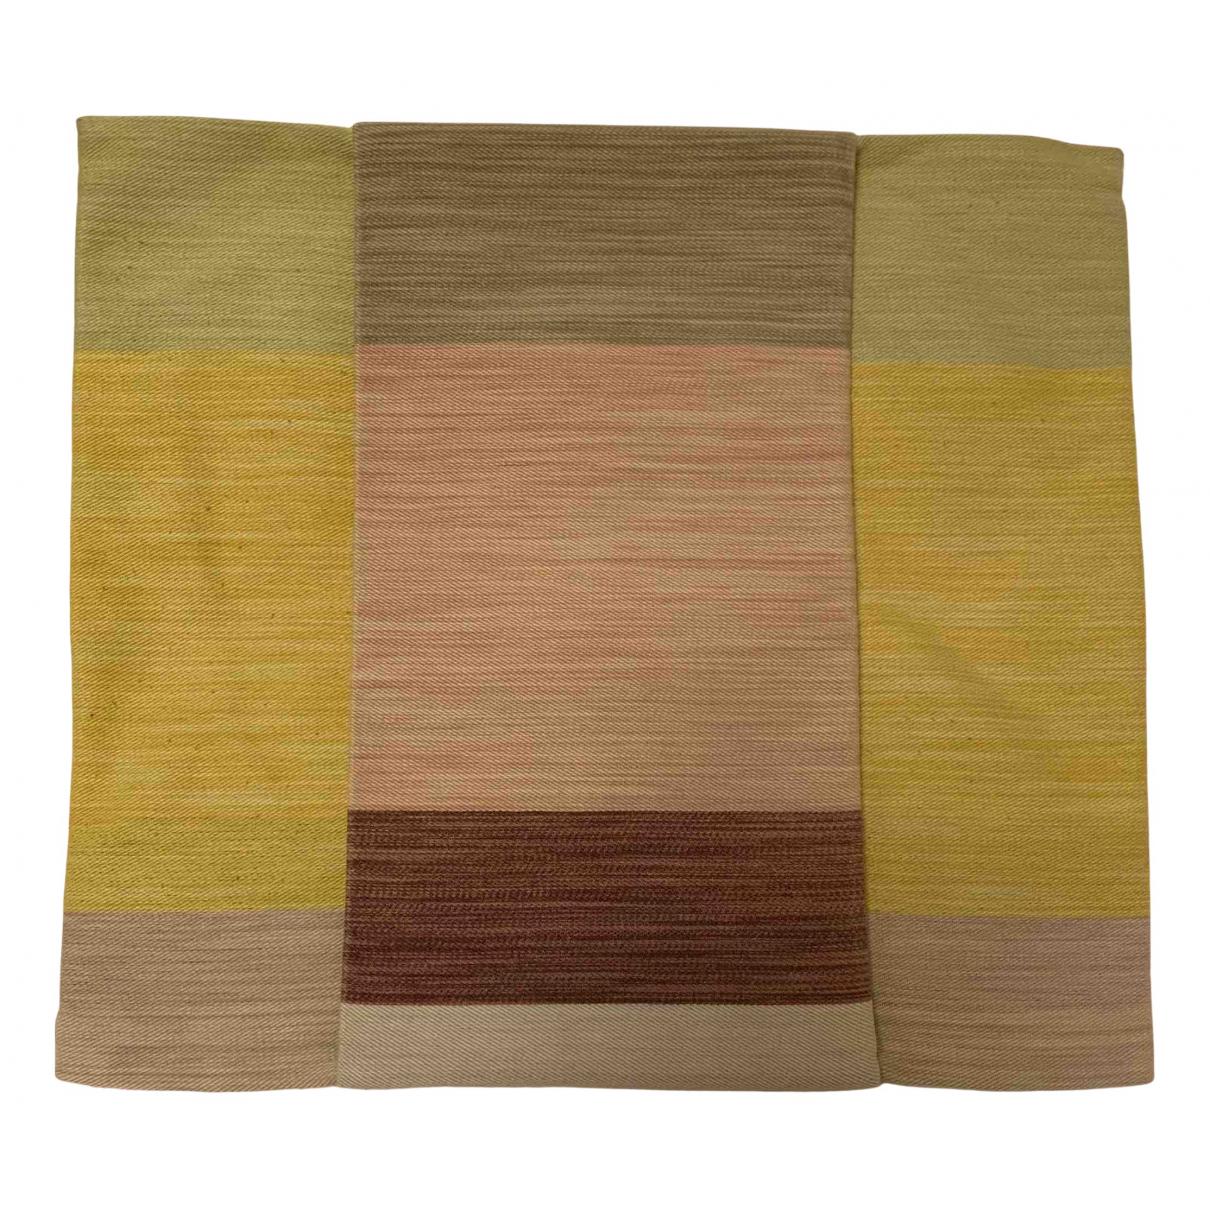 Kenzo N Multicolour Cloth Textiles for Life & Living N